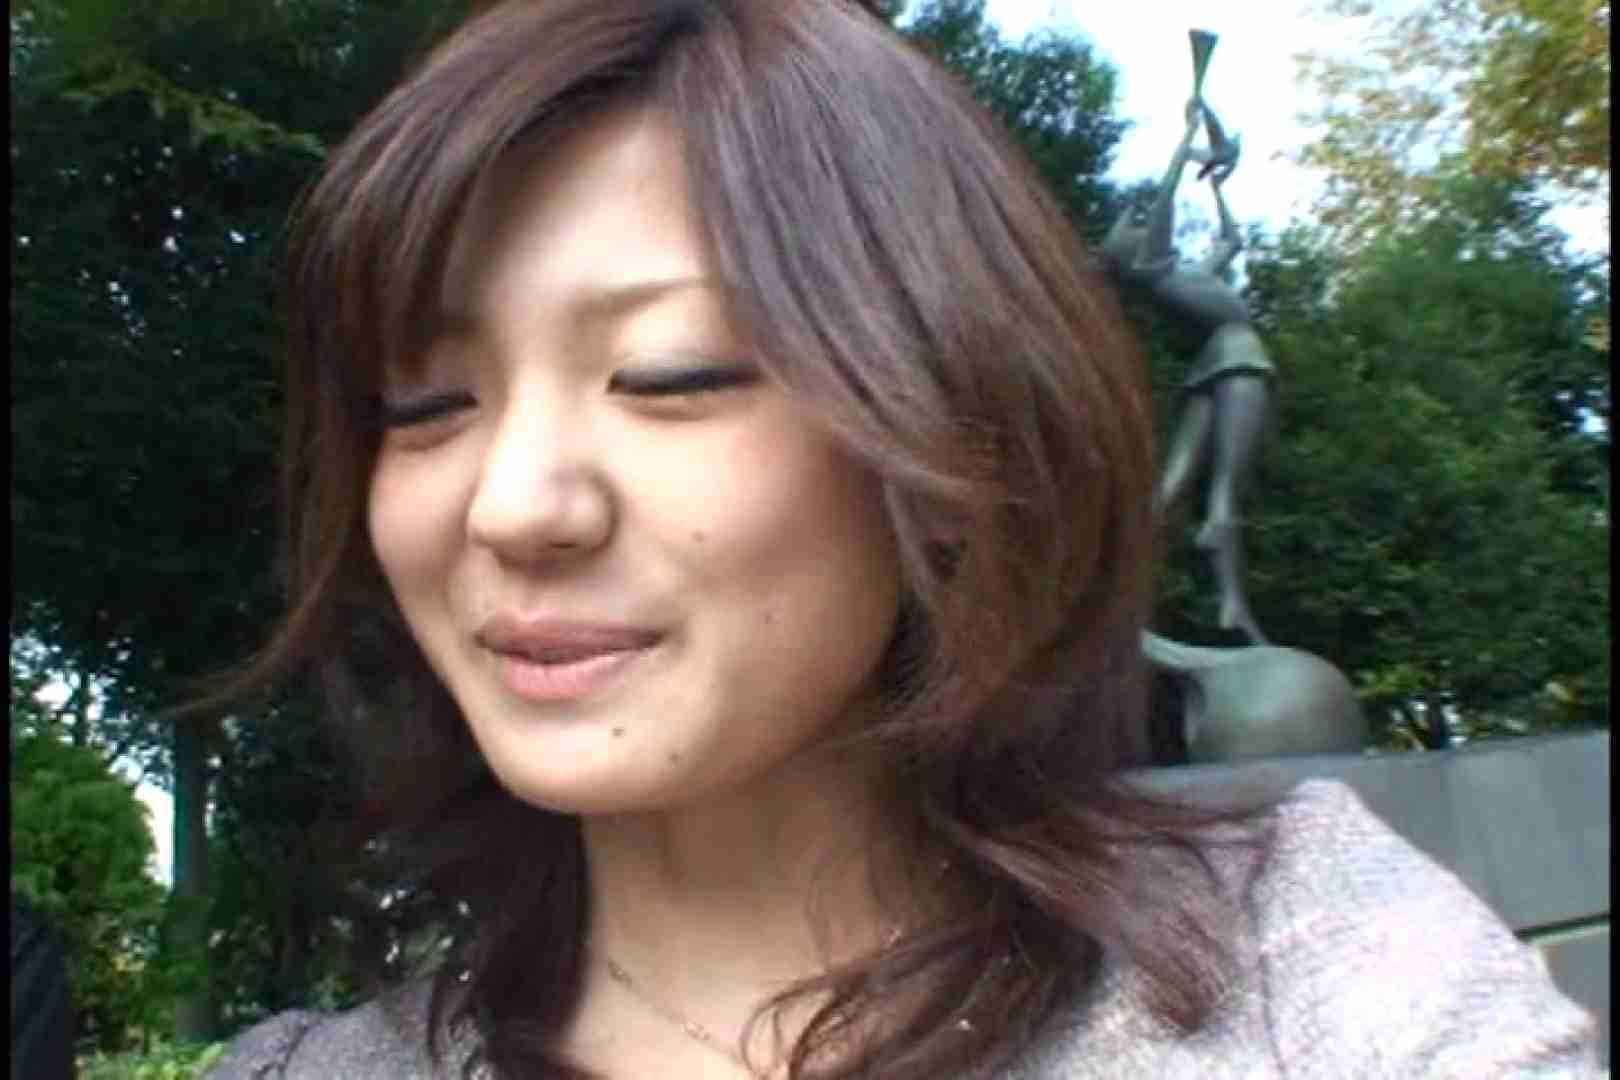 JDハンター全国ツアー vol.035 前編 女子大生のエロ動画  110PIX 30